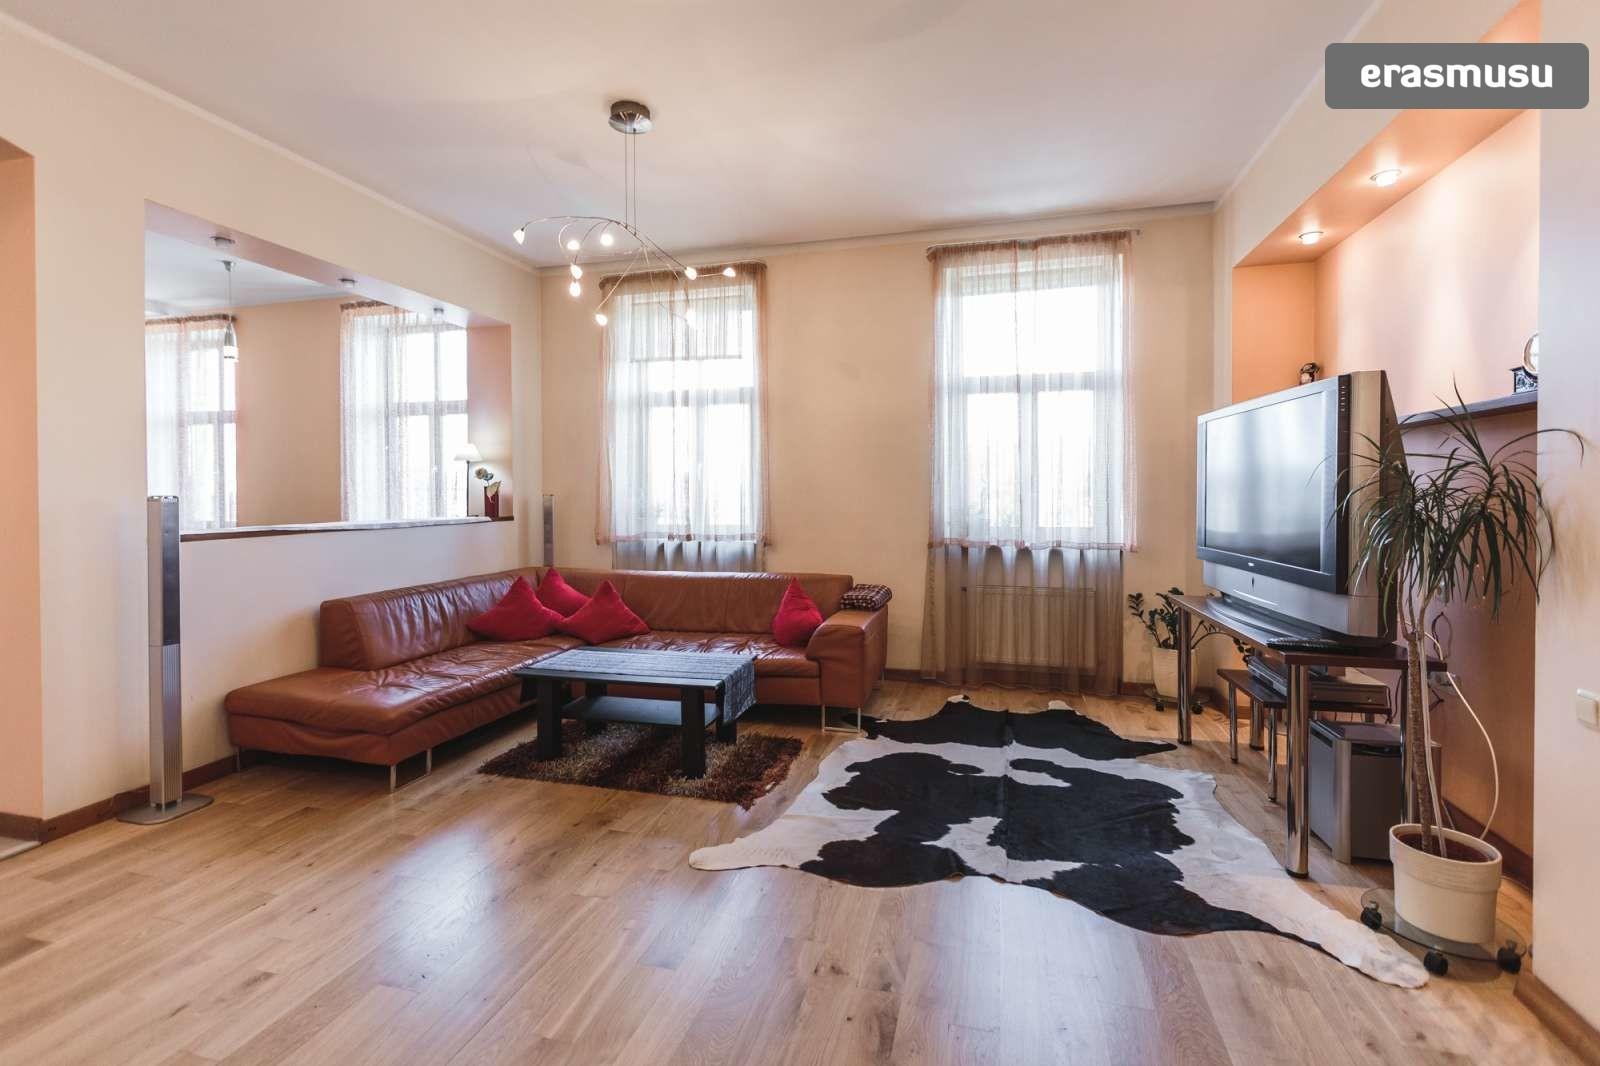 modern-4-bedroom-apartment-rent-centrs-c48e507a42222c810b21a911f